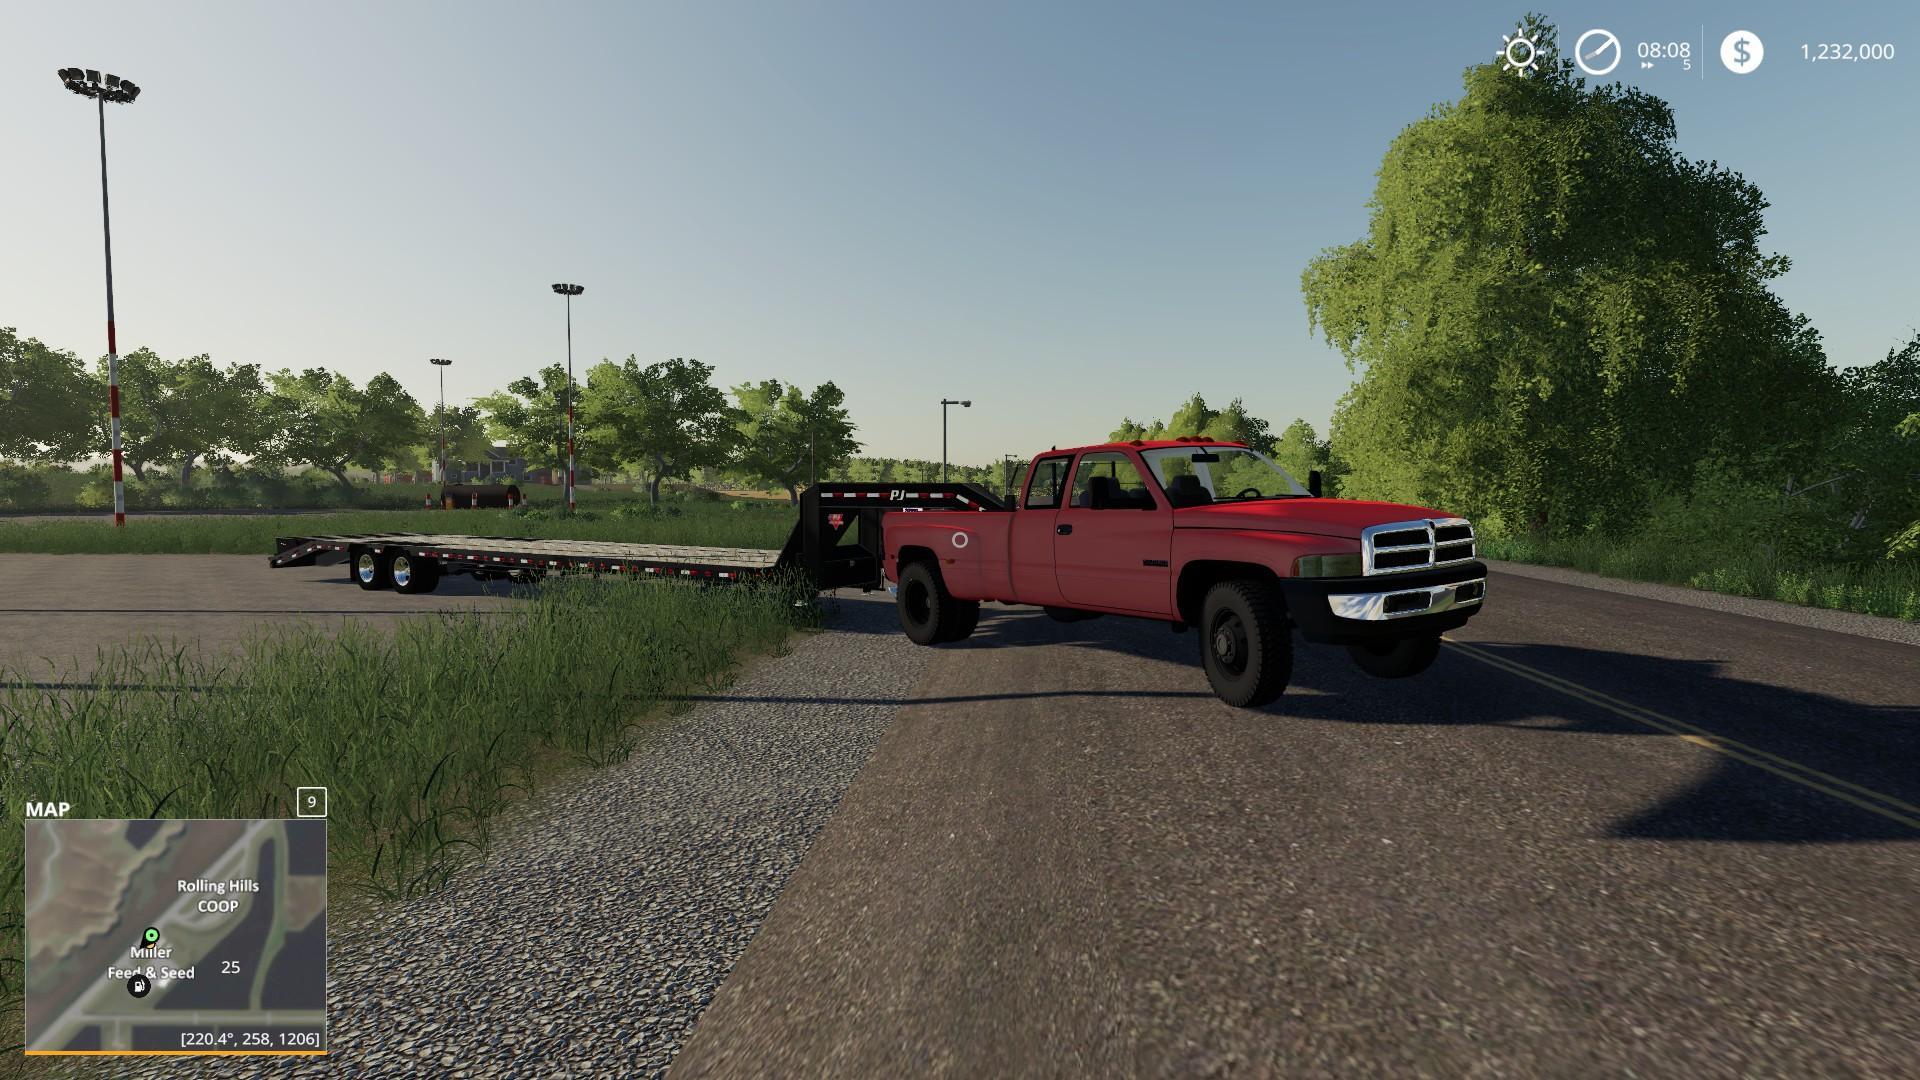 Ls2019 2nd Gen Dodge Ram 3500 V1 0 Farming Simulator 19 Mod Ls19 Mod Download